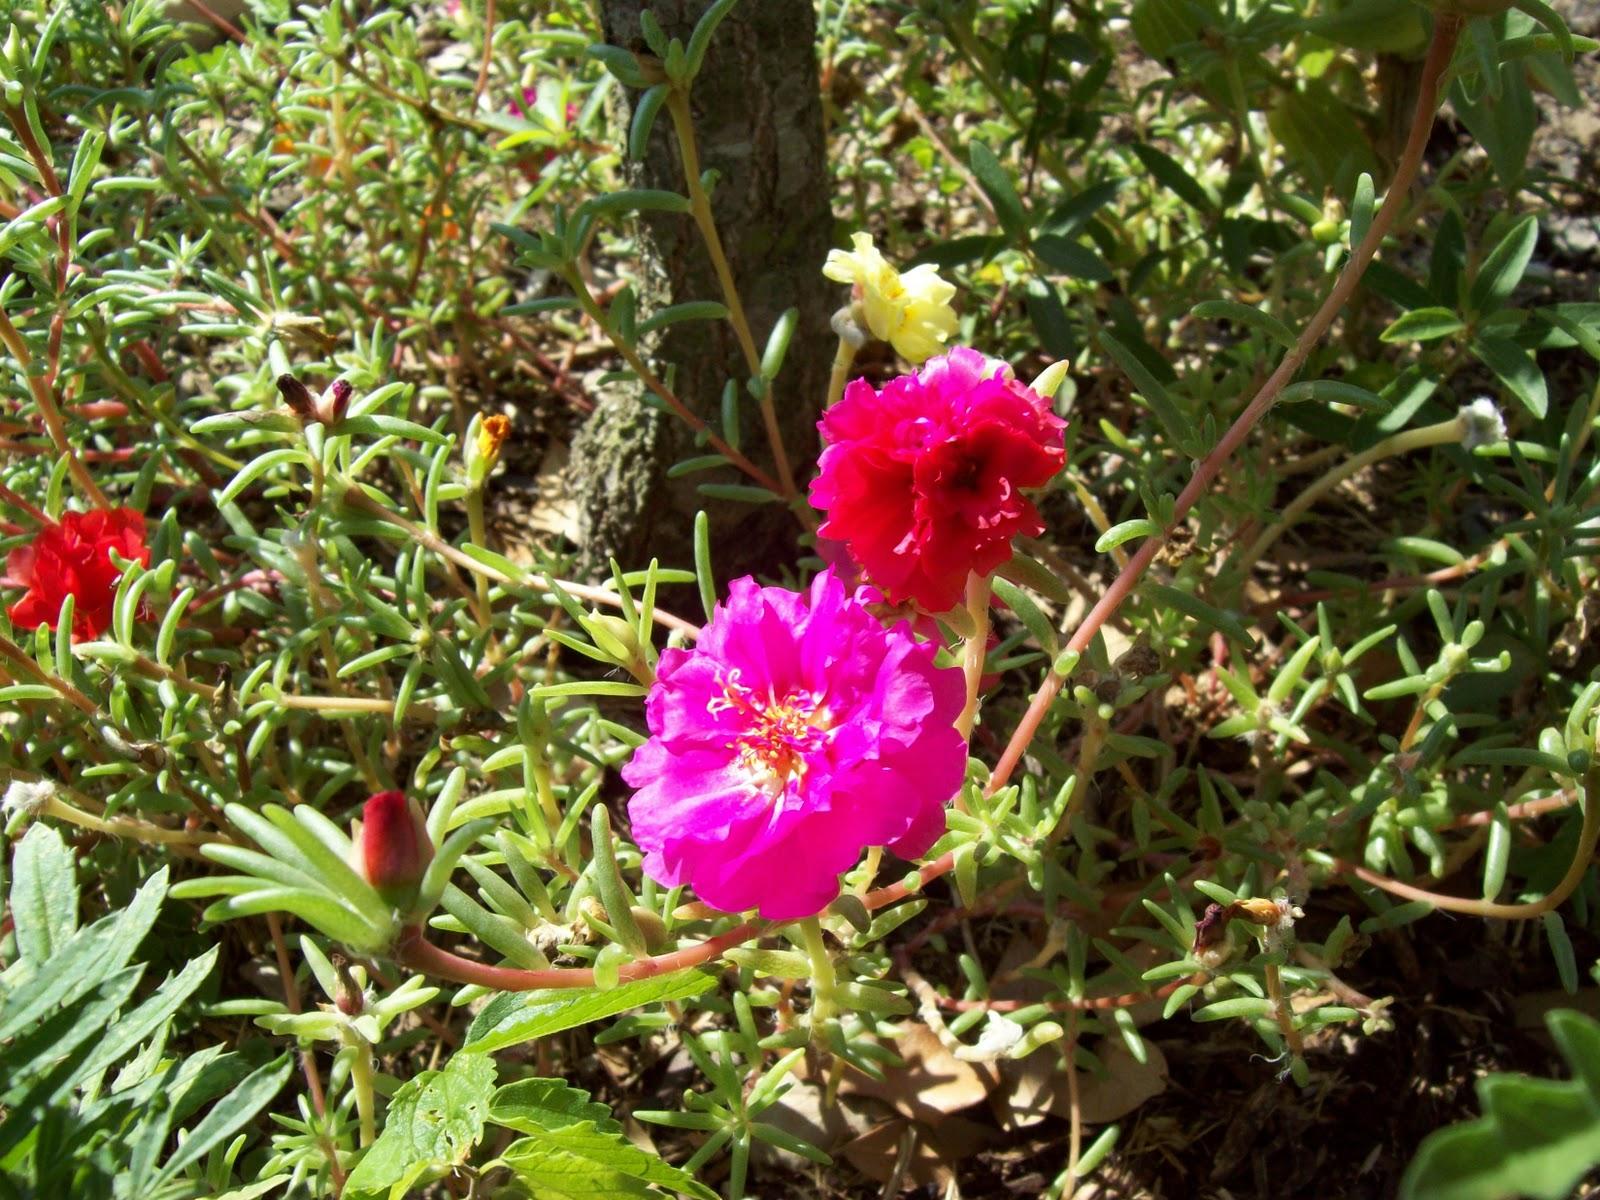 Gardening 2009 - 101_5227.JPG